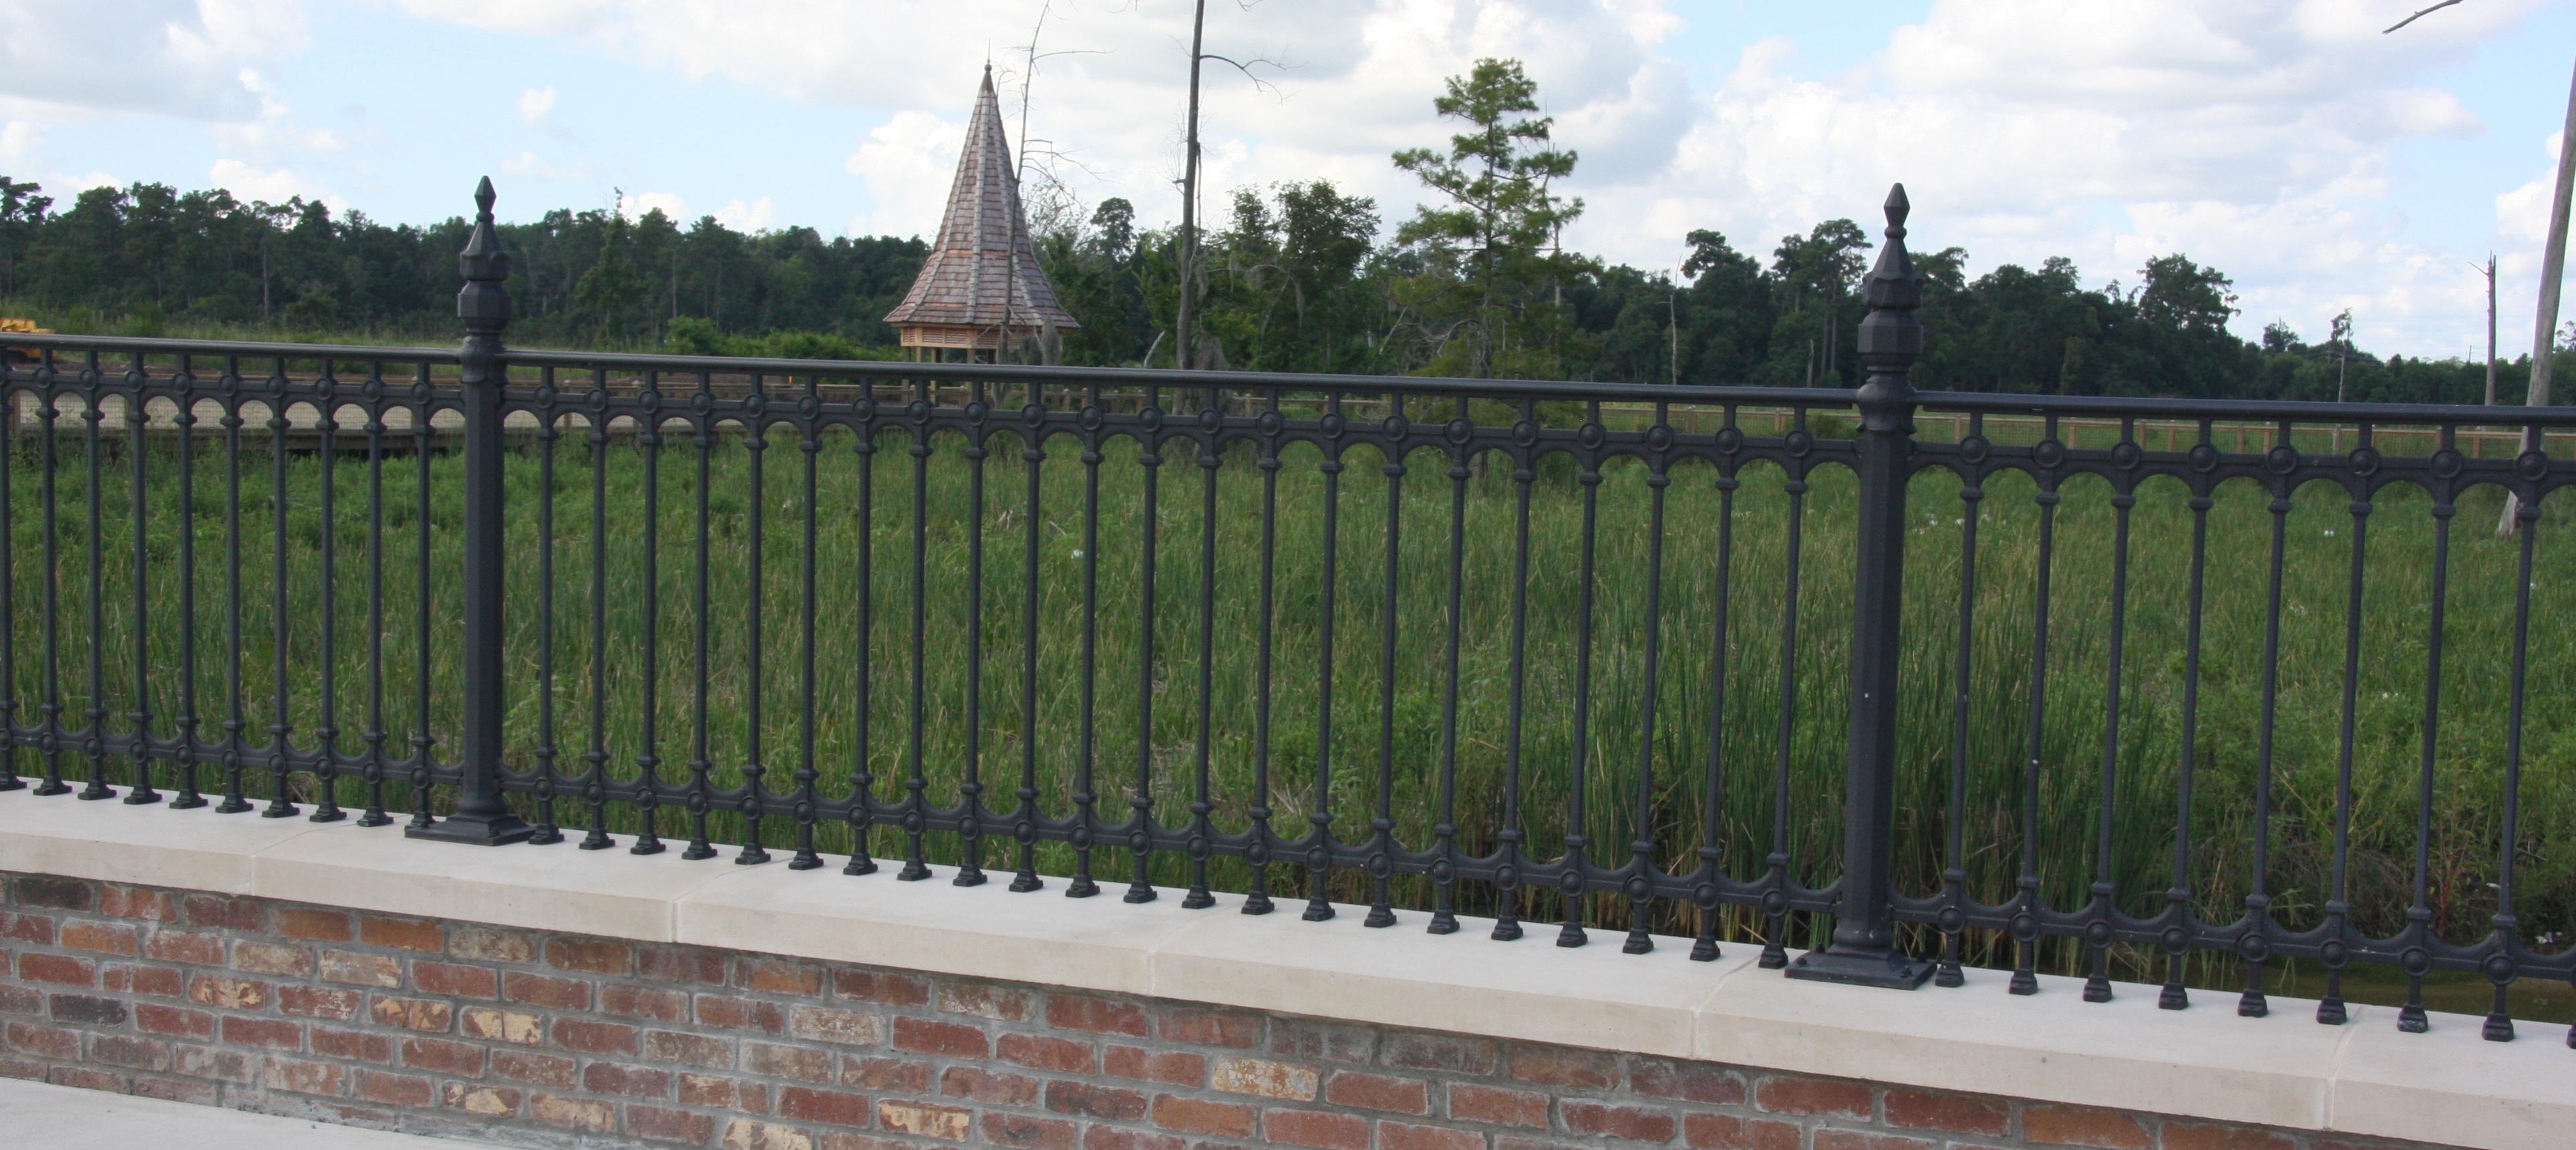 Walnut grove 36 inch tall balcony railing 102 78 linear ft